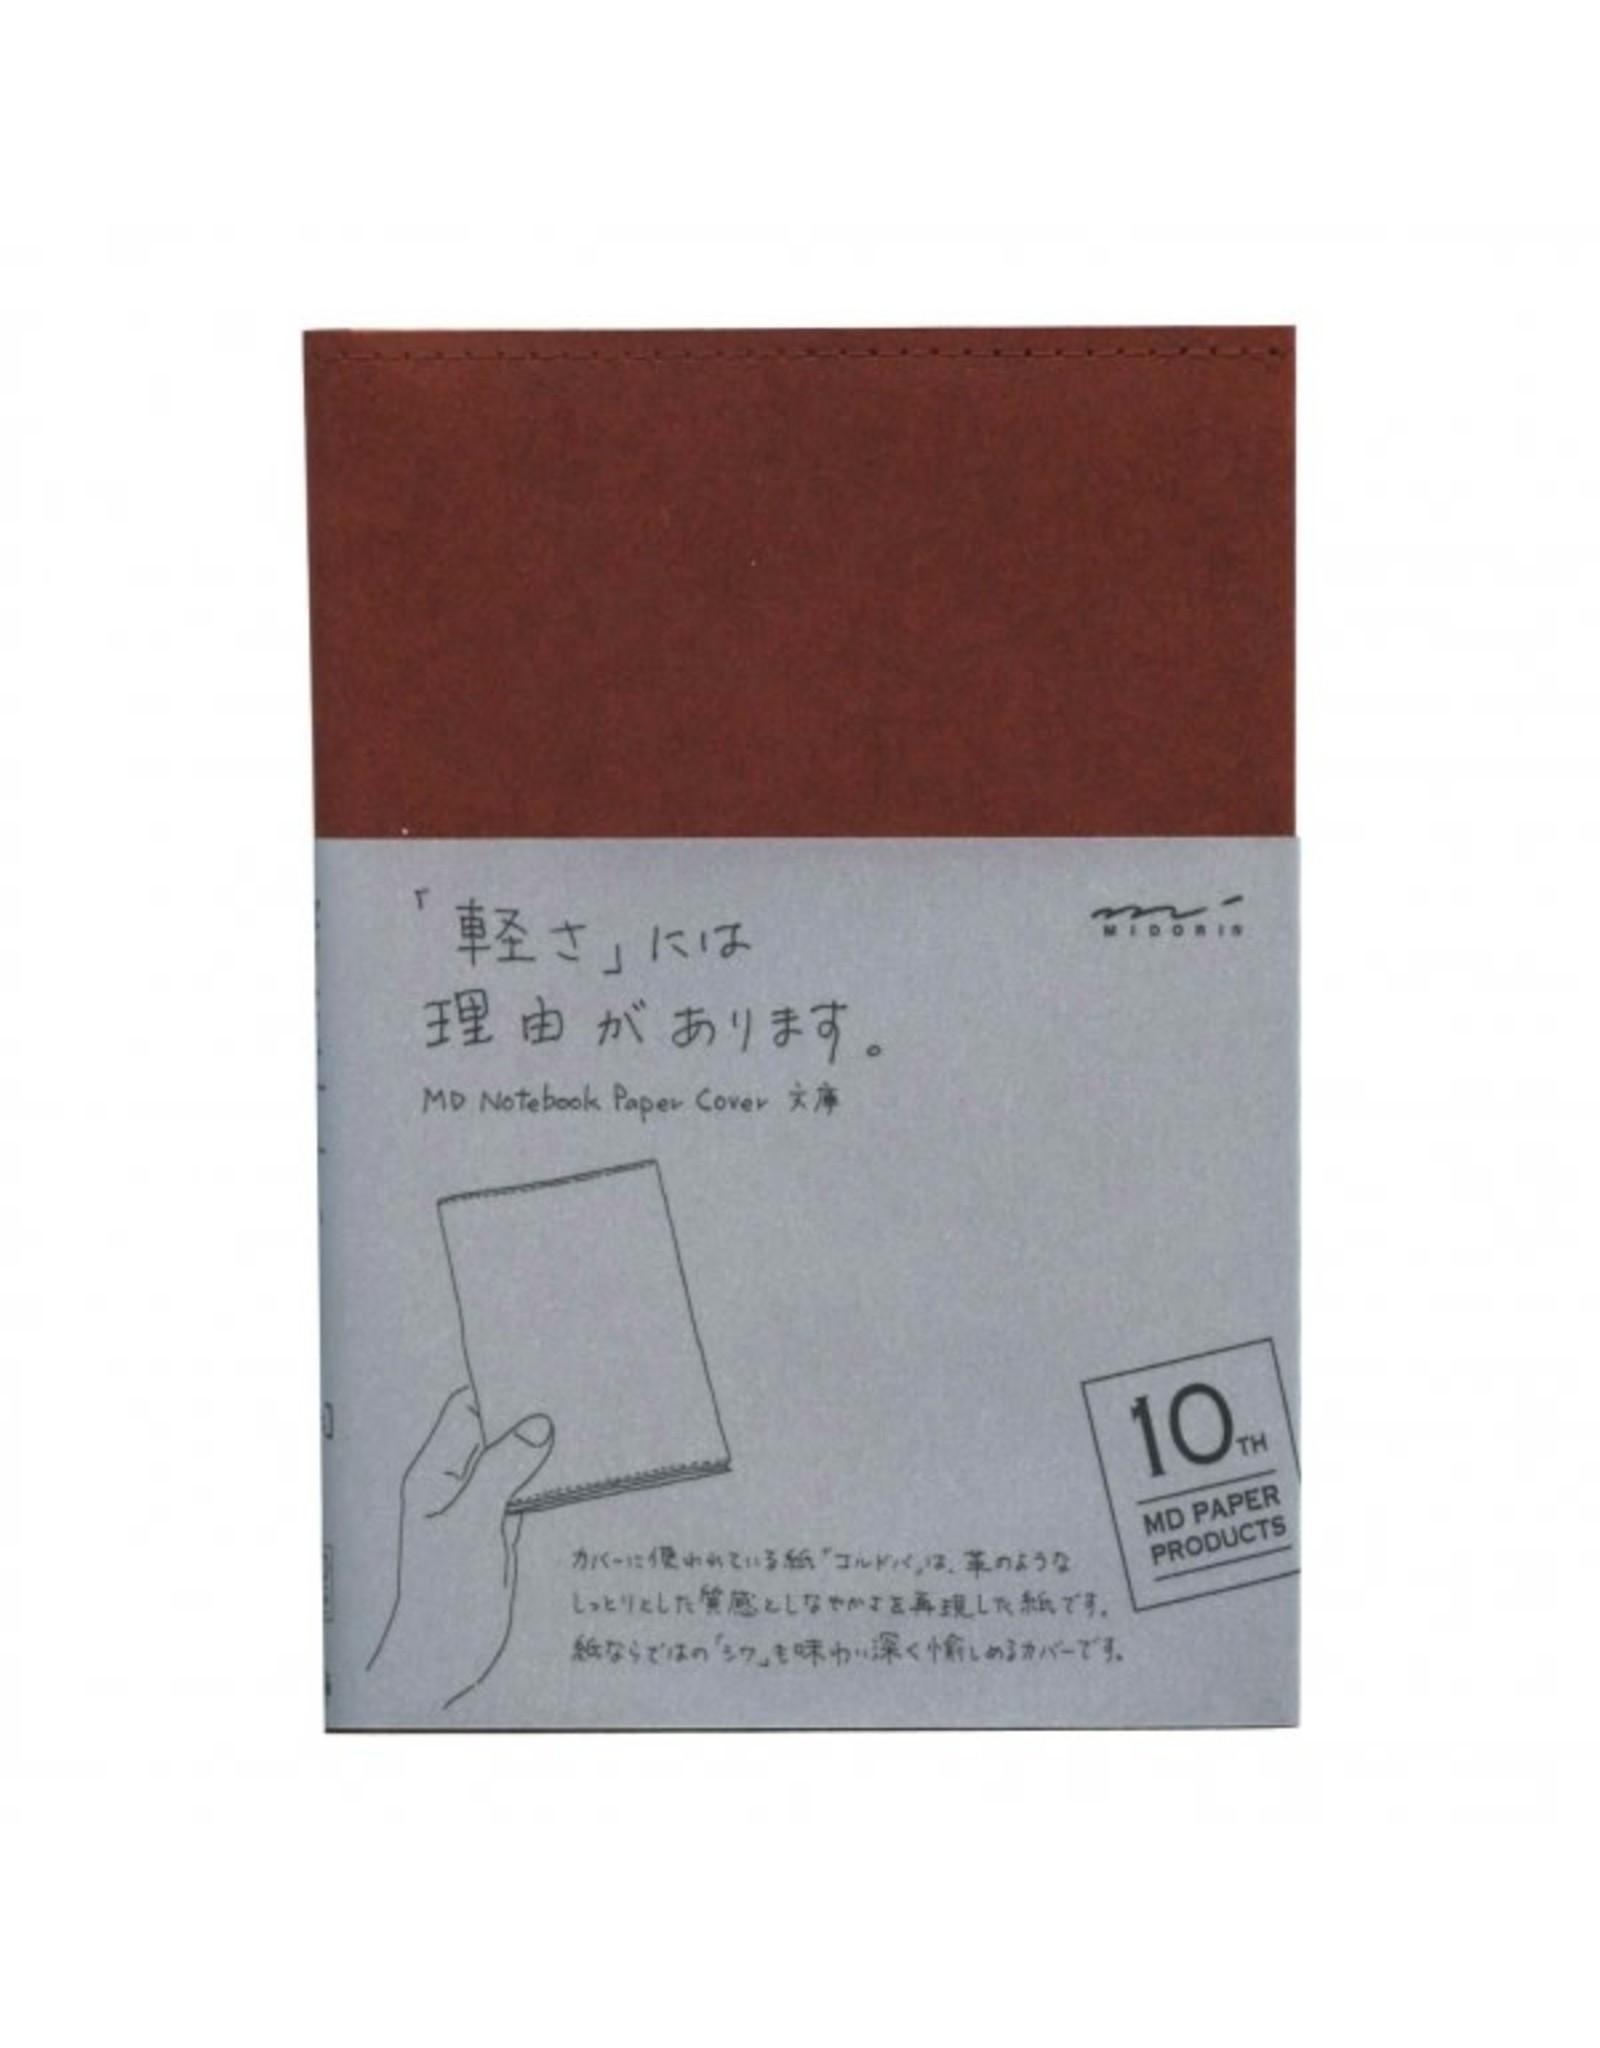 Designphil Inc. 10TH ANNIVERSARY MD NOTEBOOK COVER [PAPER] BUNKO